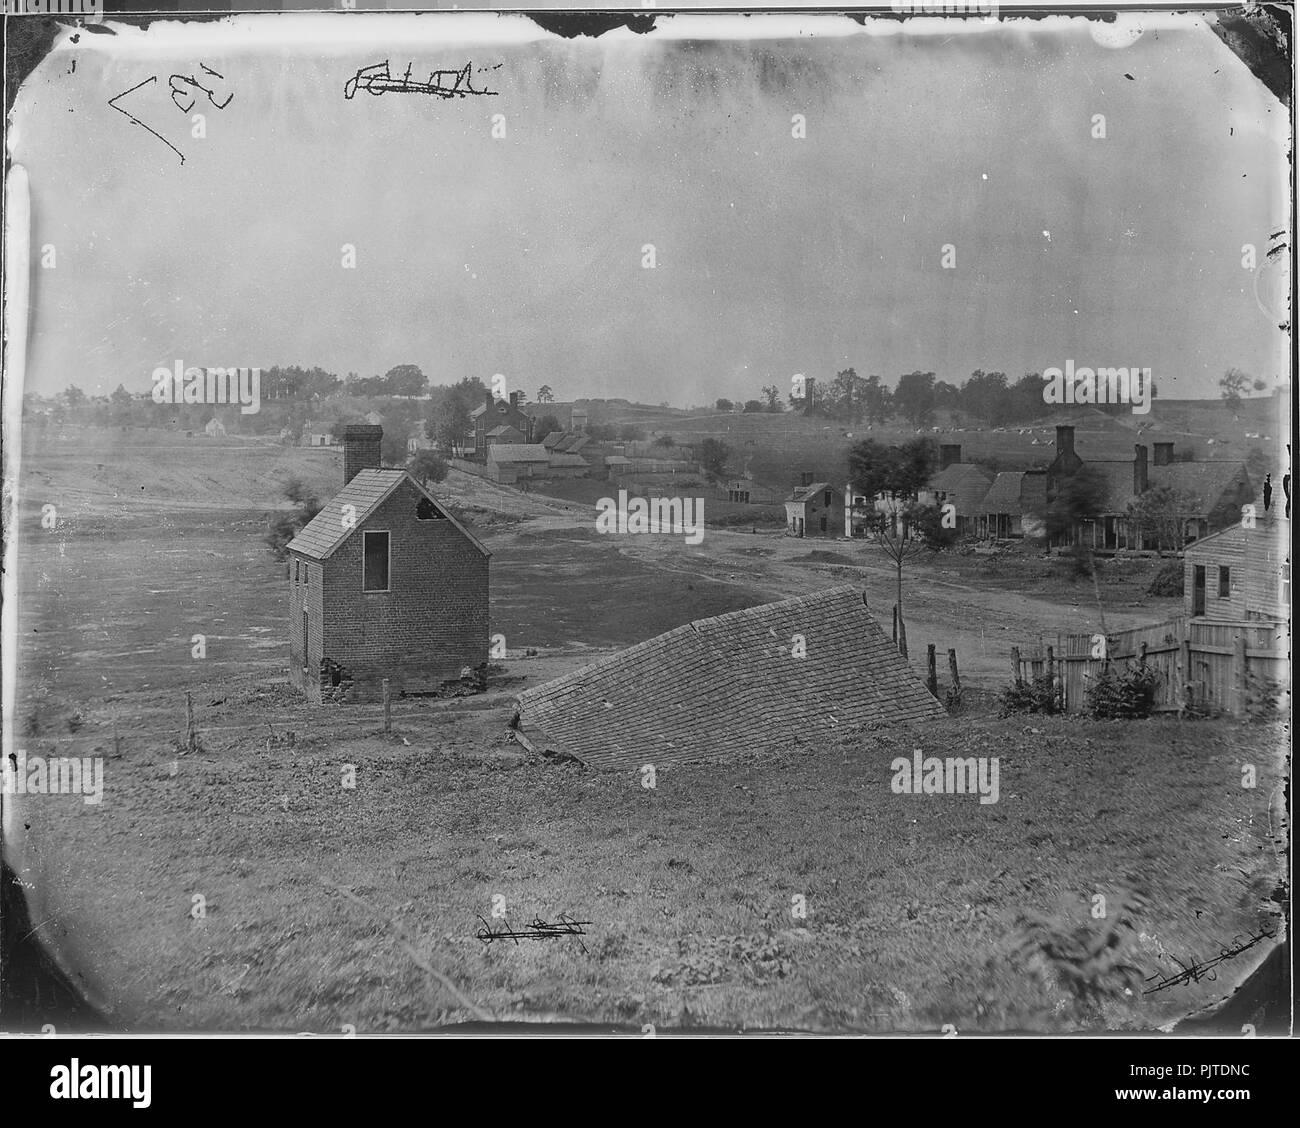 Fredericksburg Battlefield Stock Photos & Fredericksburg